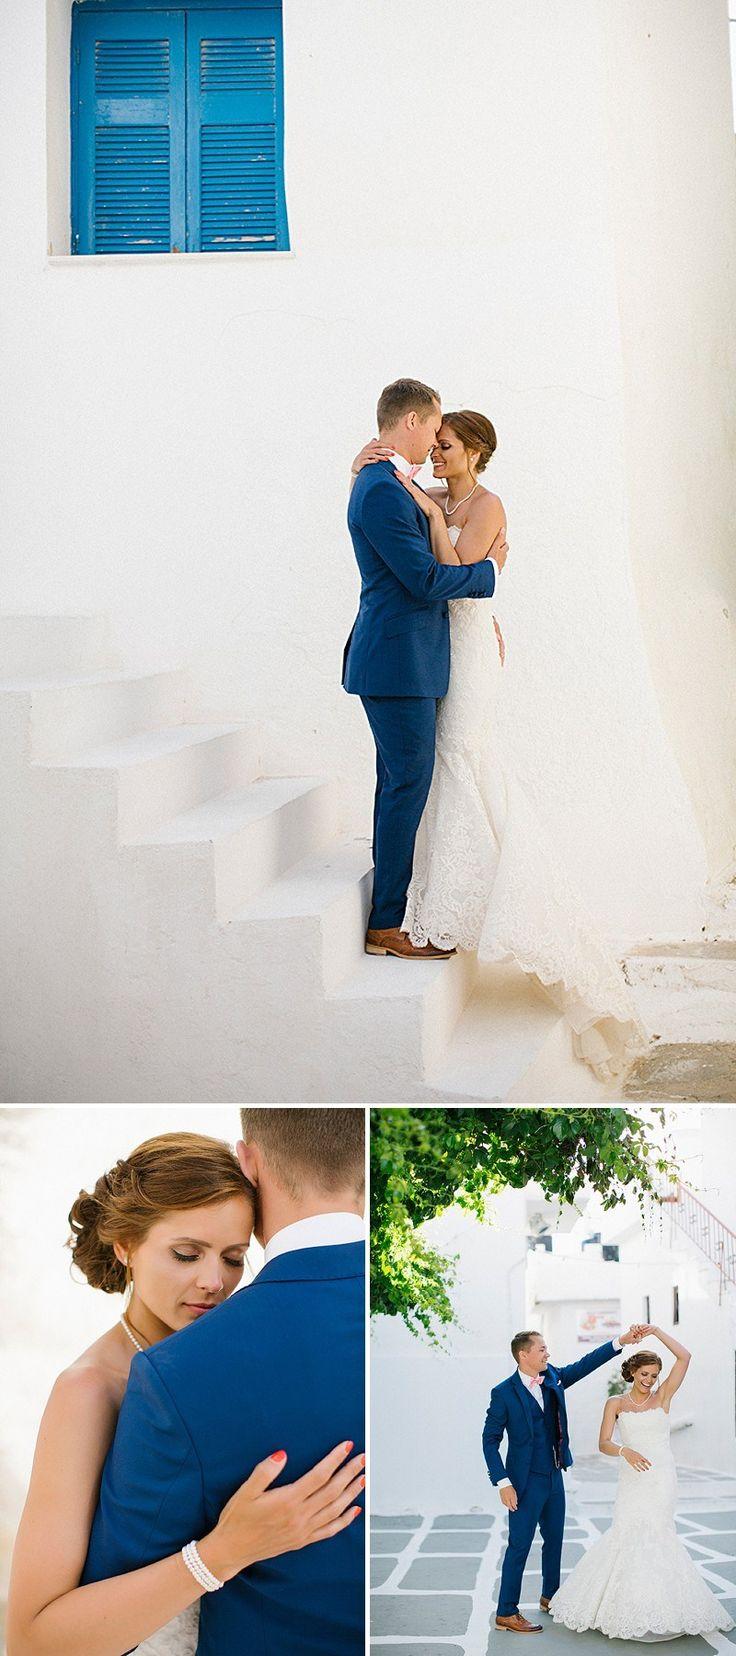 best greek wedding images on pinterest weddings wedding ideas